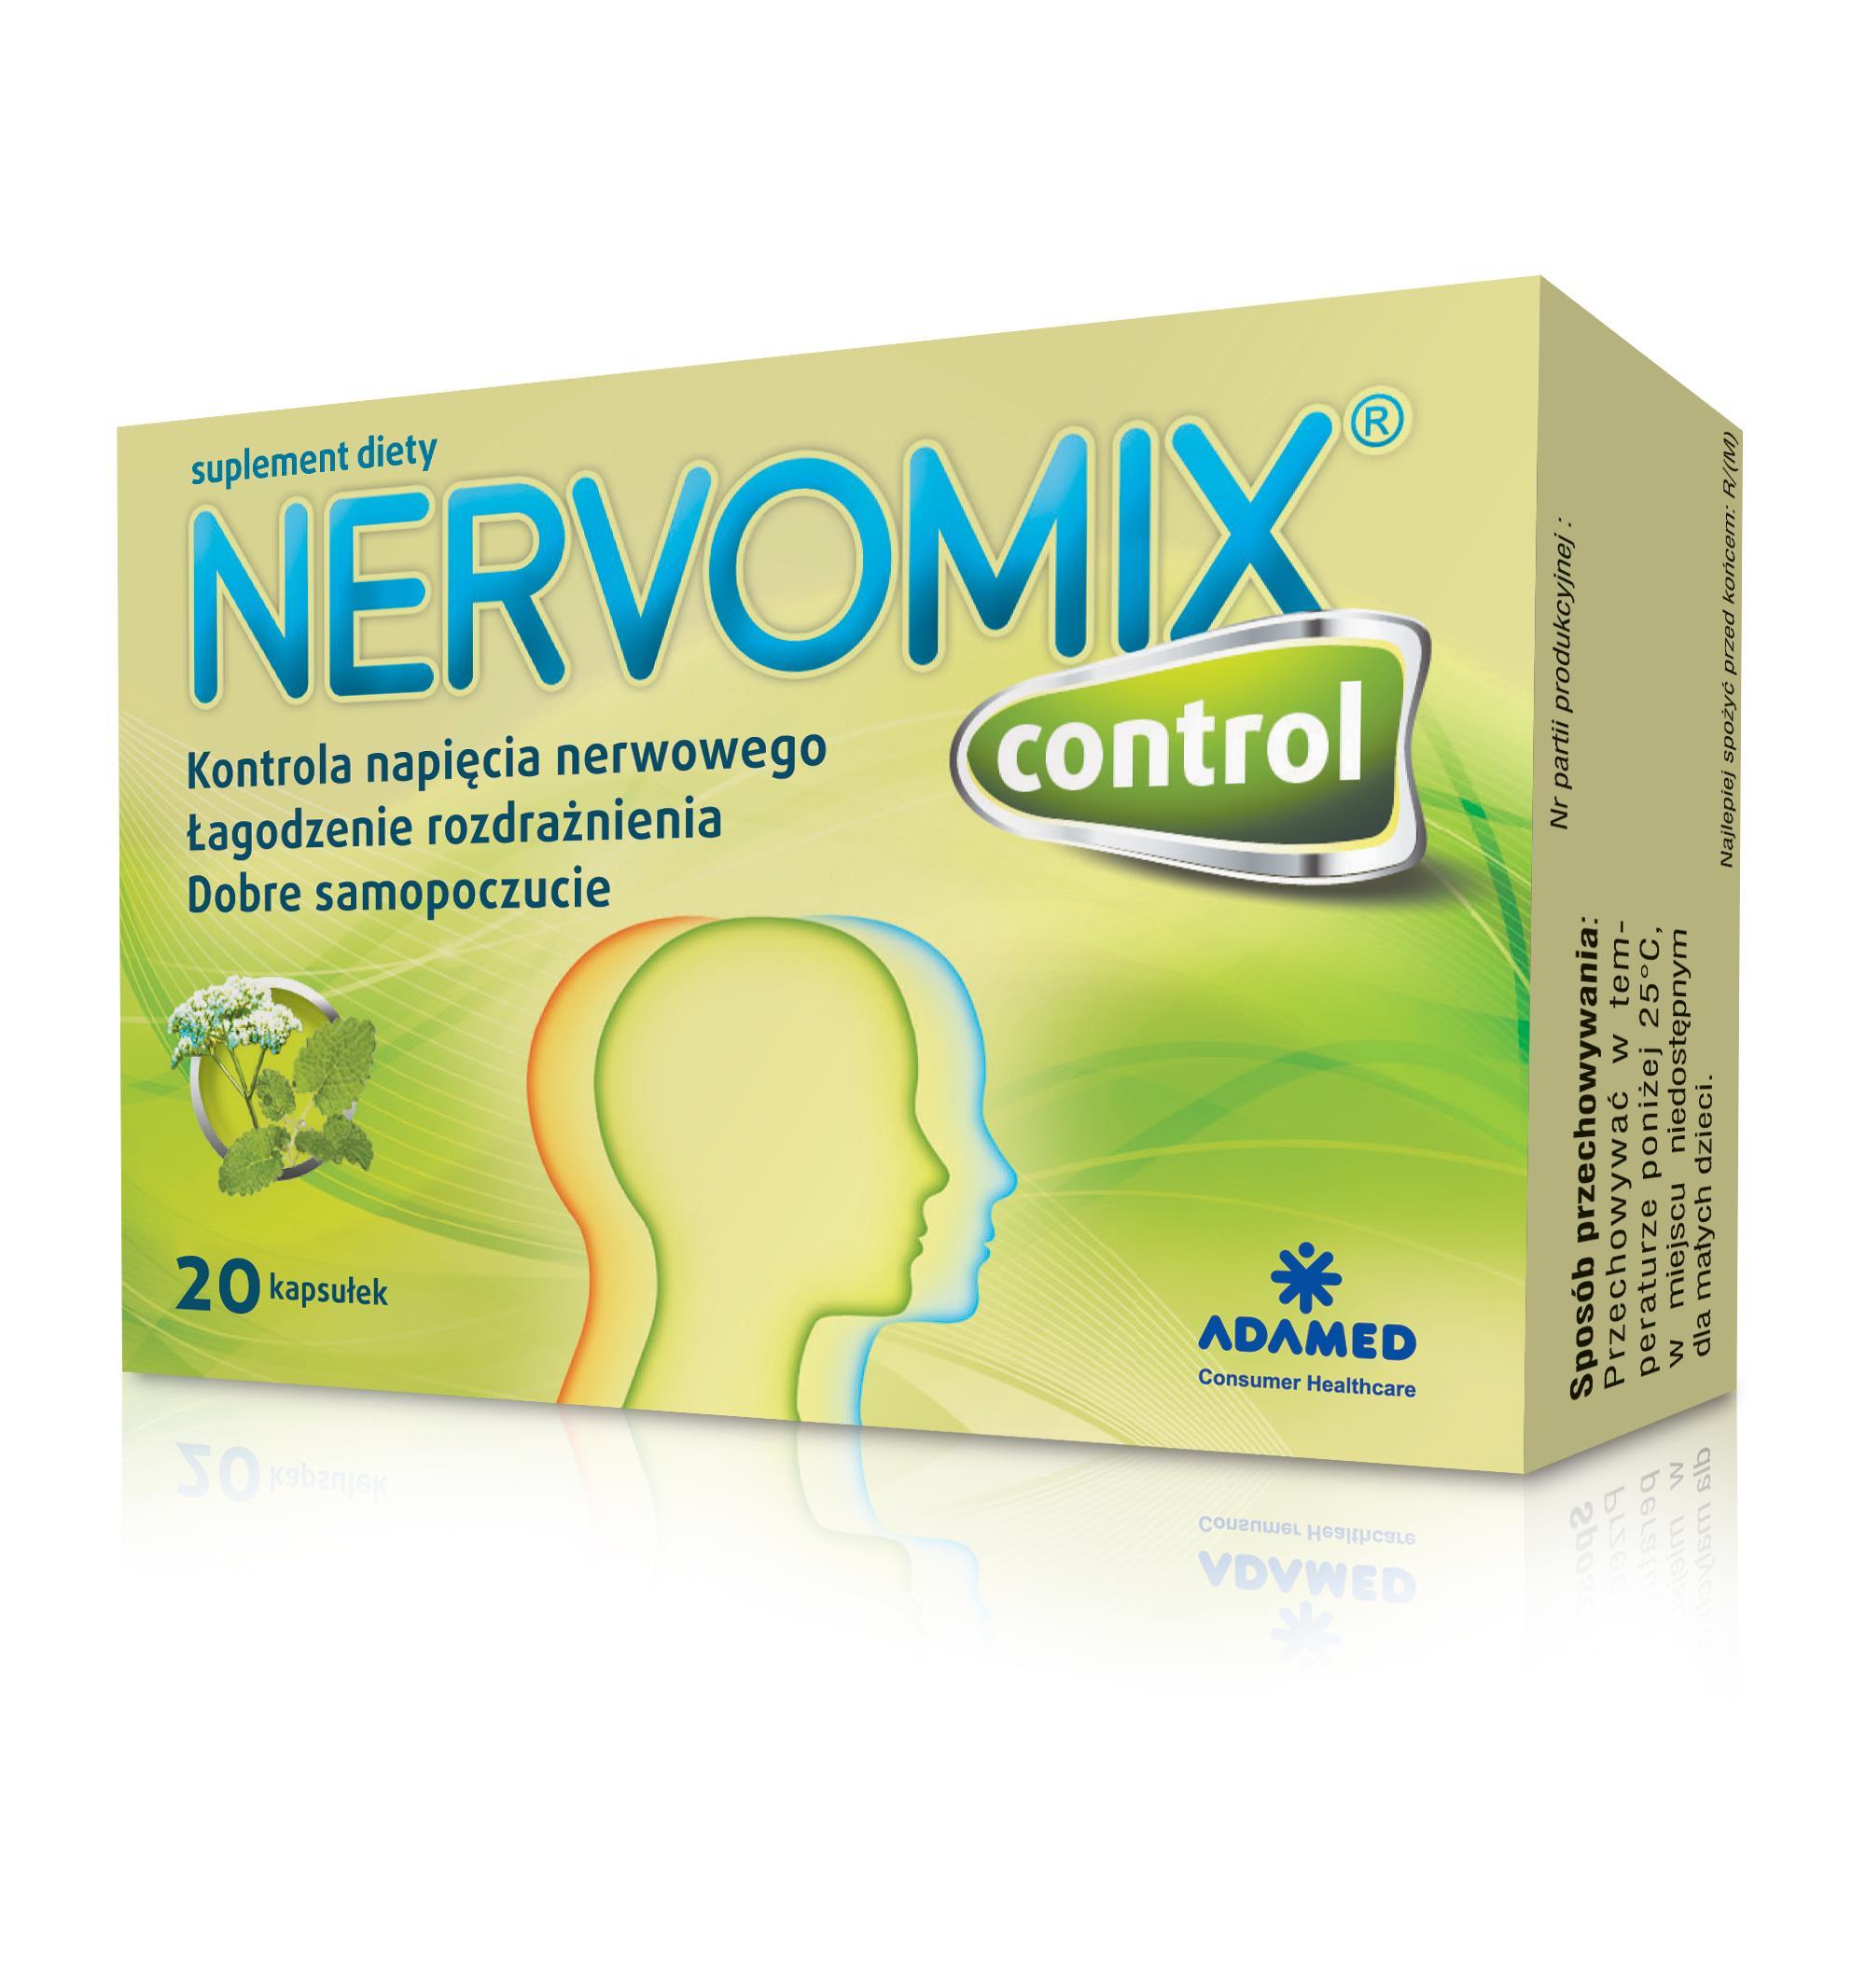 Nerwomix Control